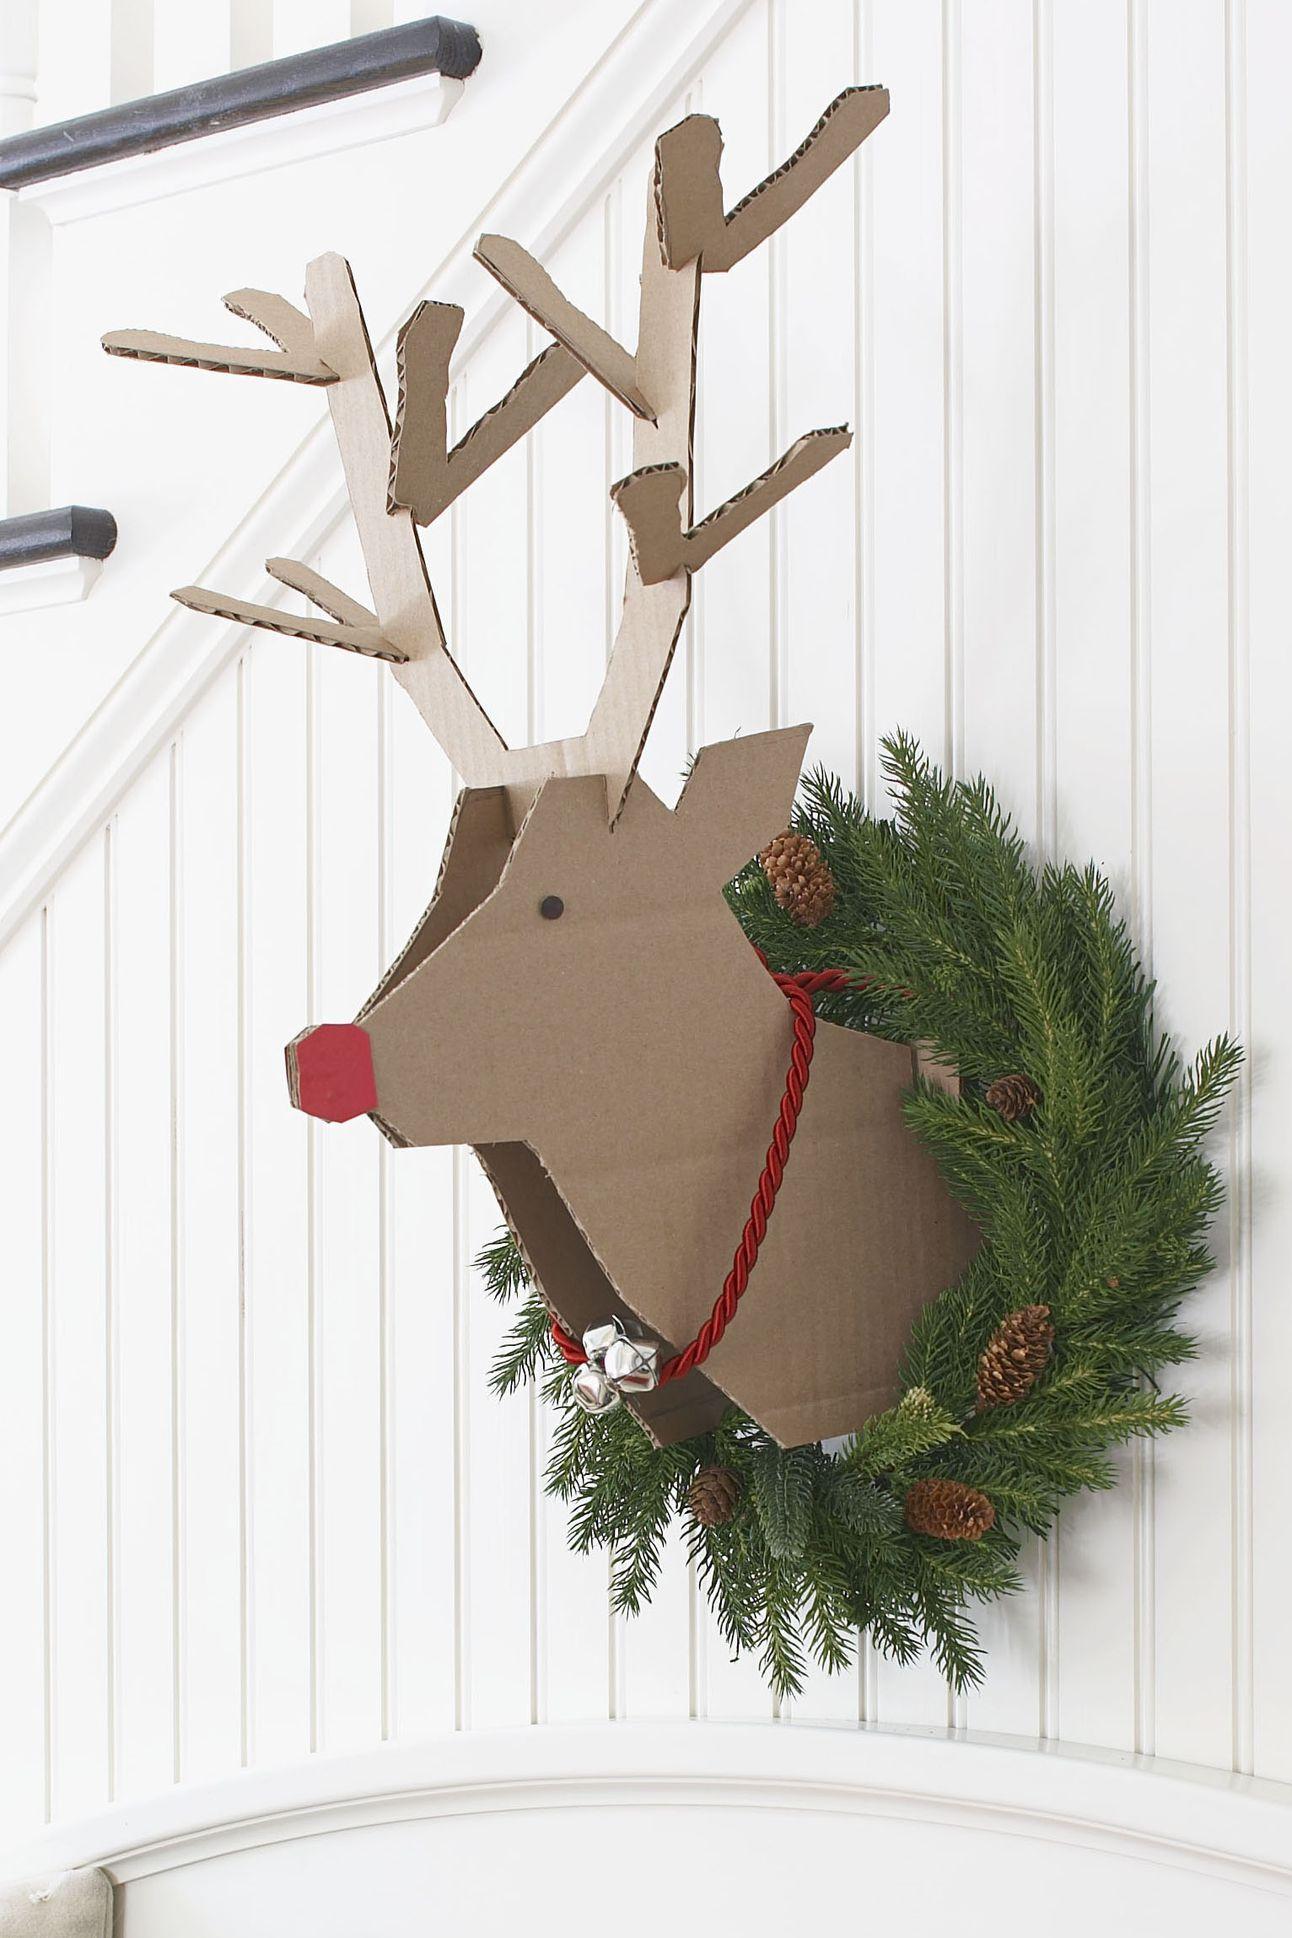 10 Scandinavian Inspired Christmas Decorating Ideas Scandinavian Christmas Decorations Office Christmas Scandinavian Christmas